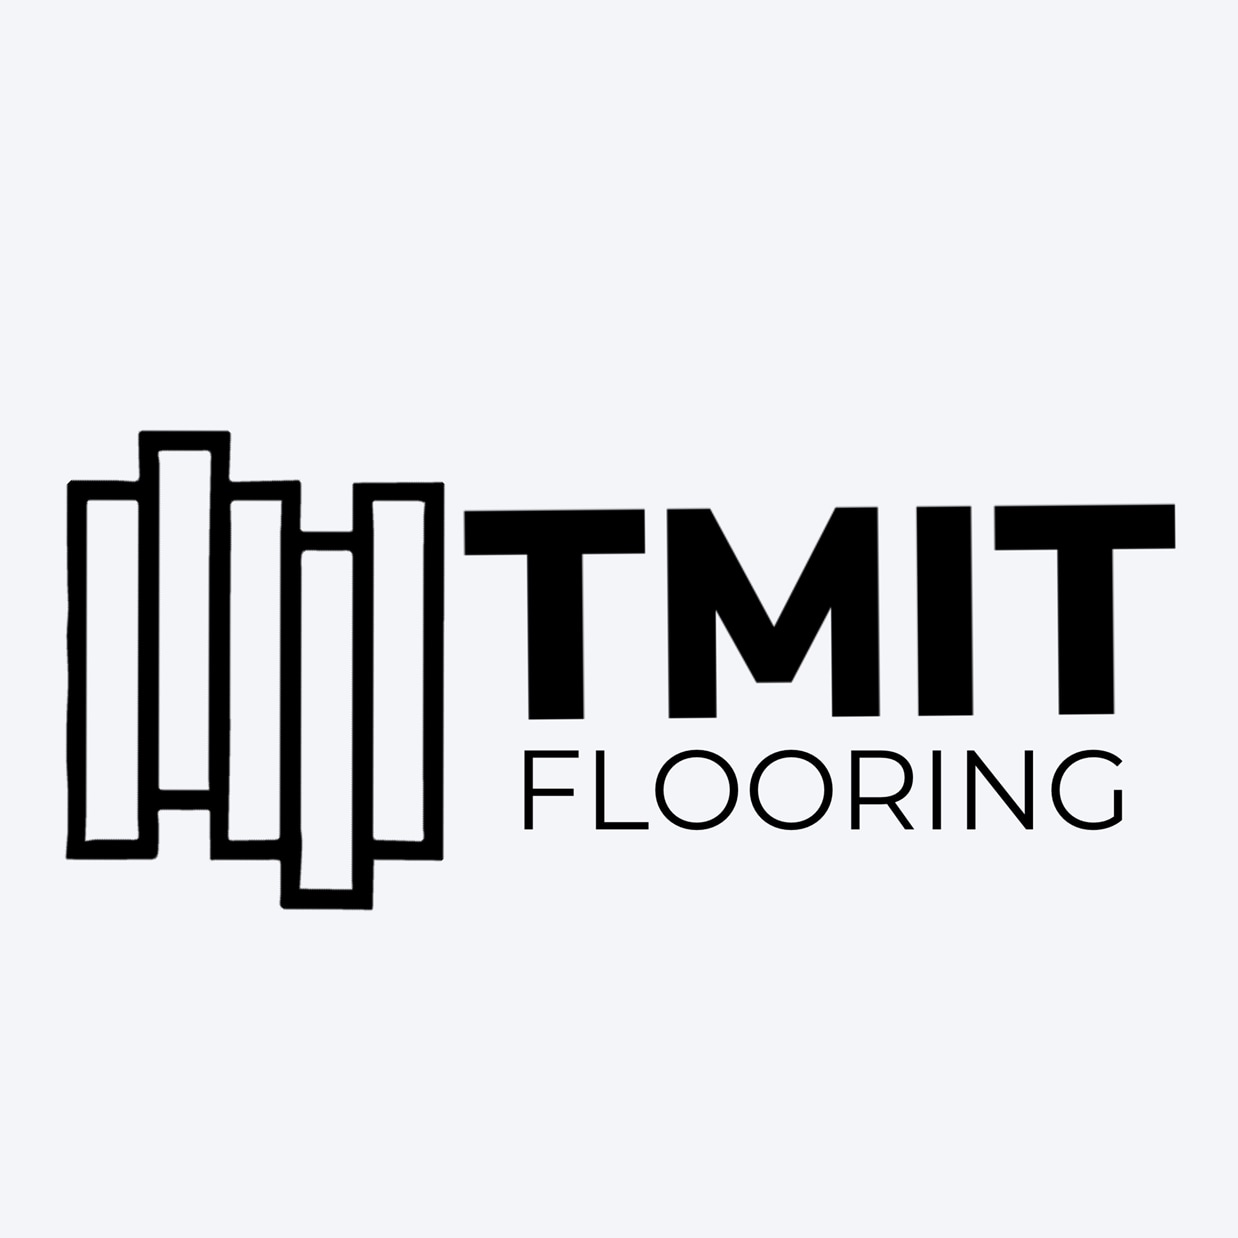 TMIT FLOORING